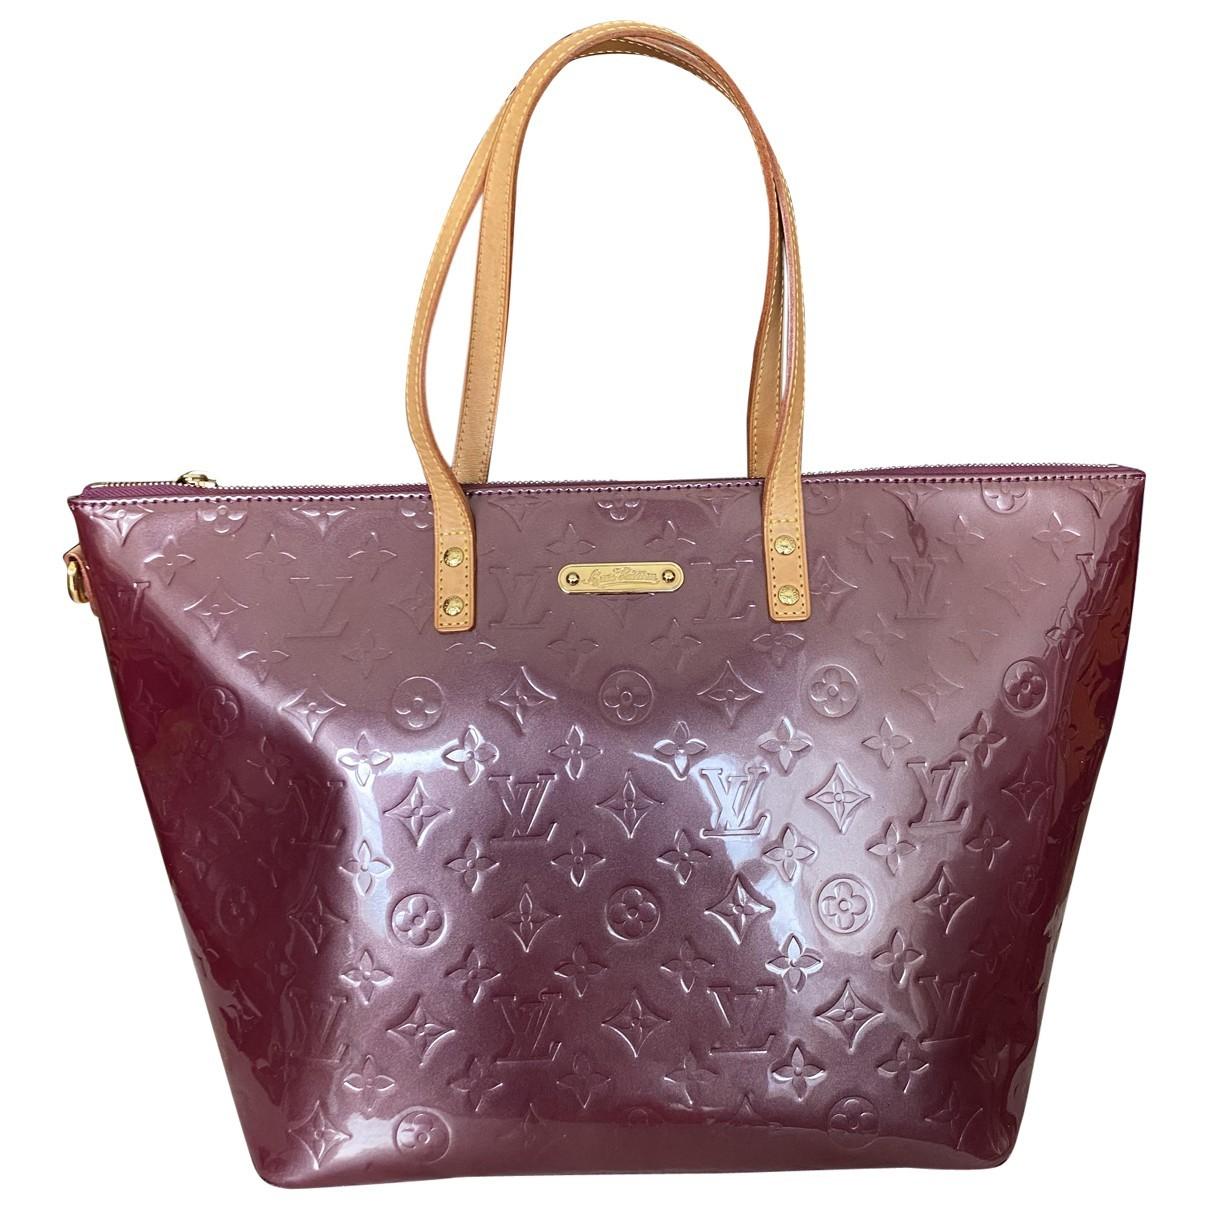 Louis Vuitton Bellevue Burgundy Patent leather handbag for Women \N